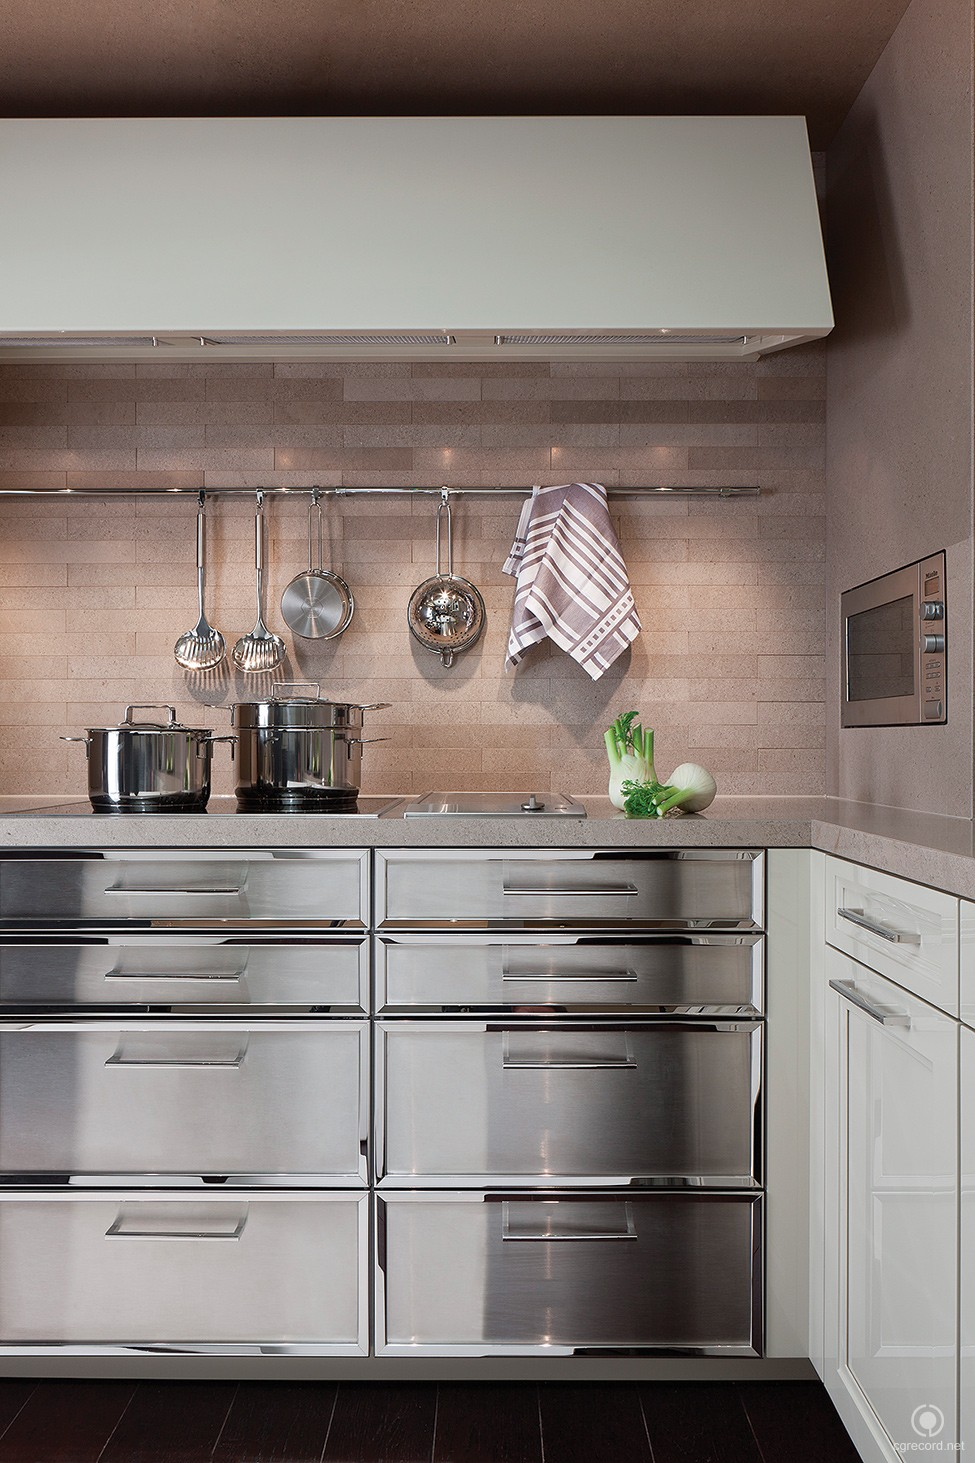 siematic kitchens. Black Bedroom Furniture Sets. Home Design Ideas